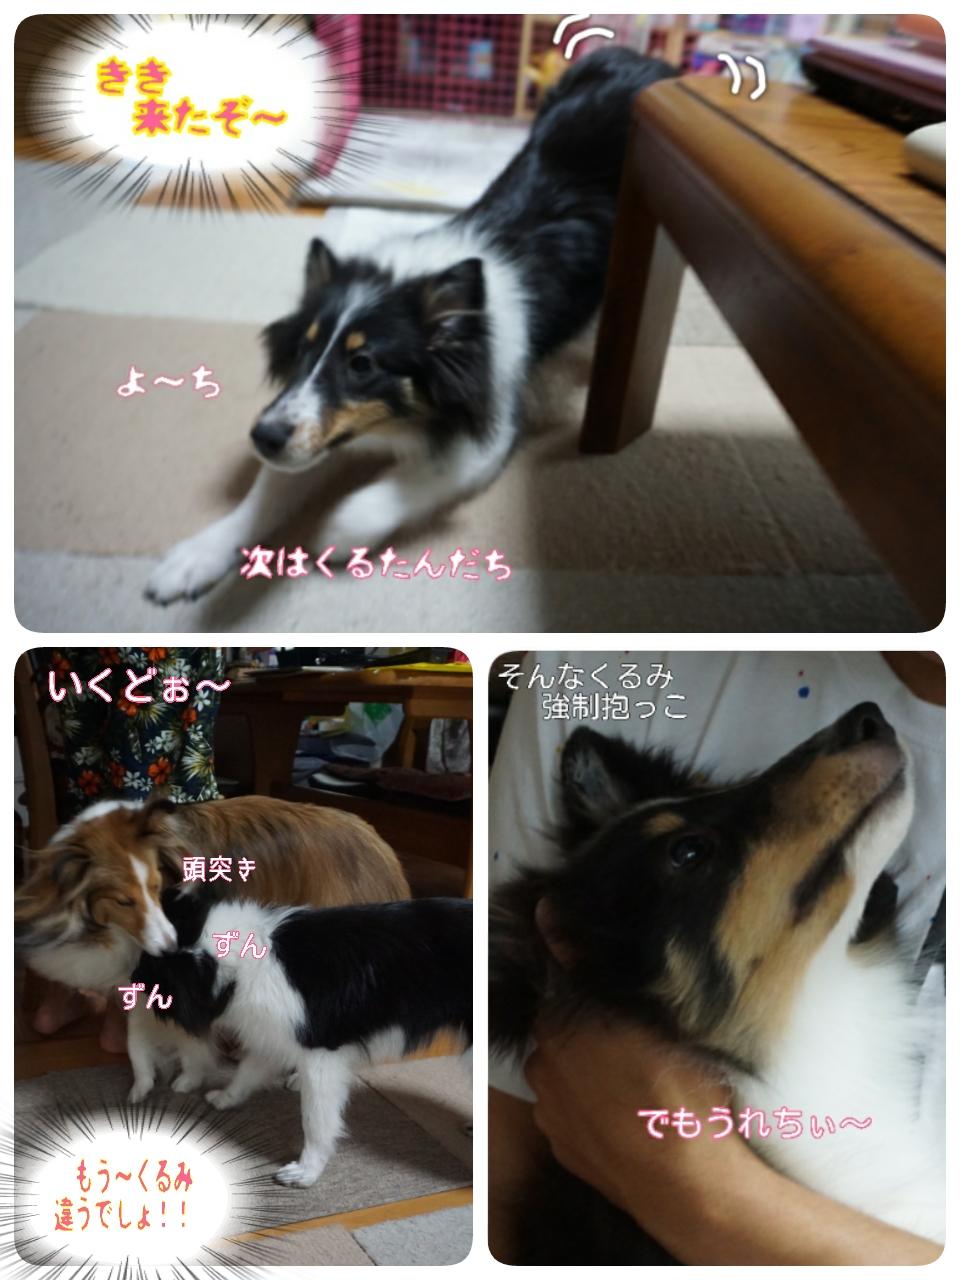 2015-08-22-01-20-11_deco.jpg